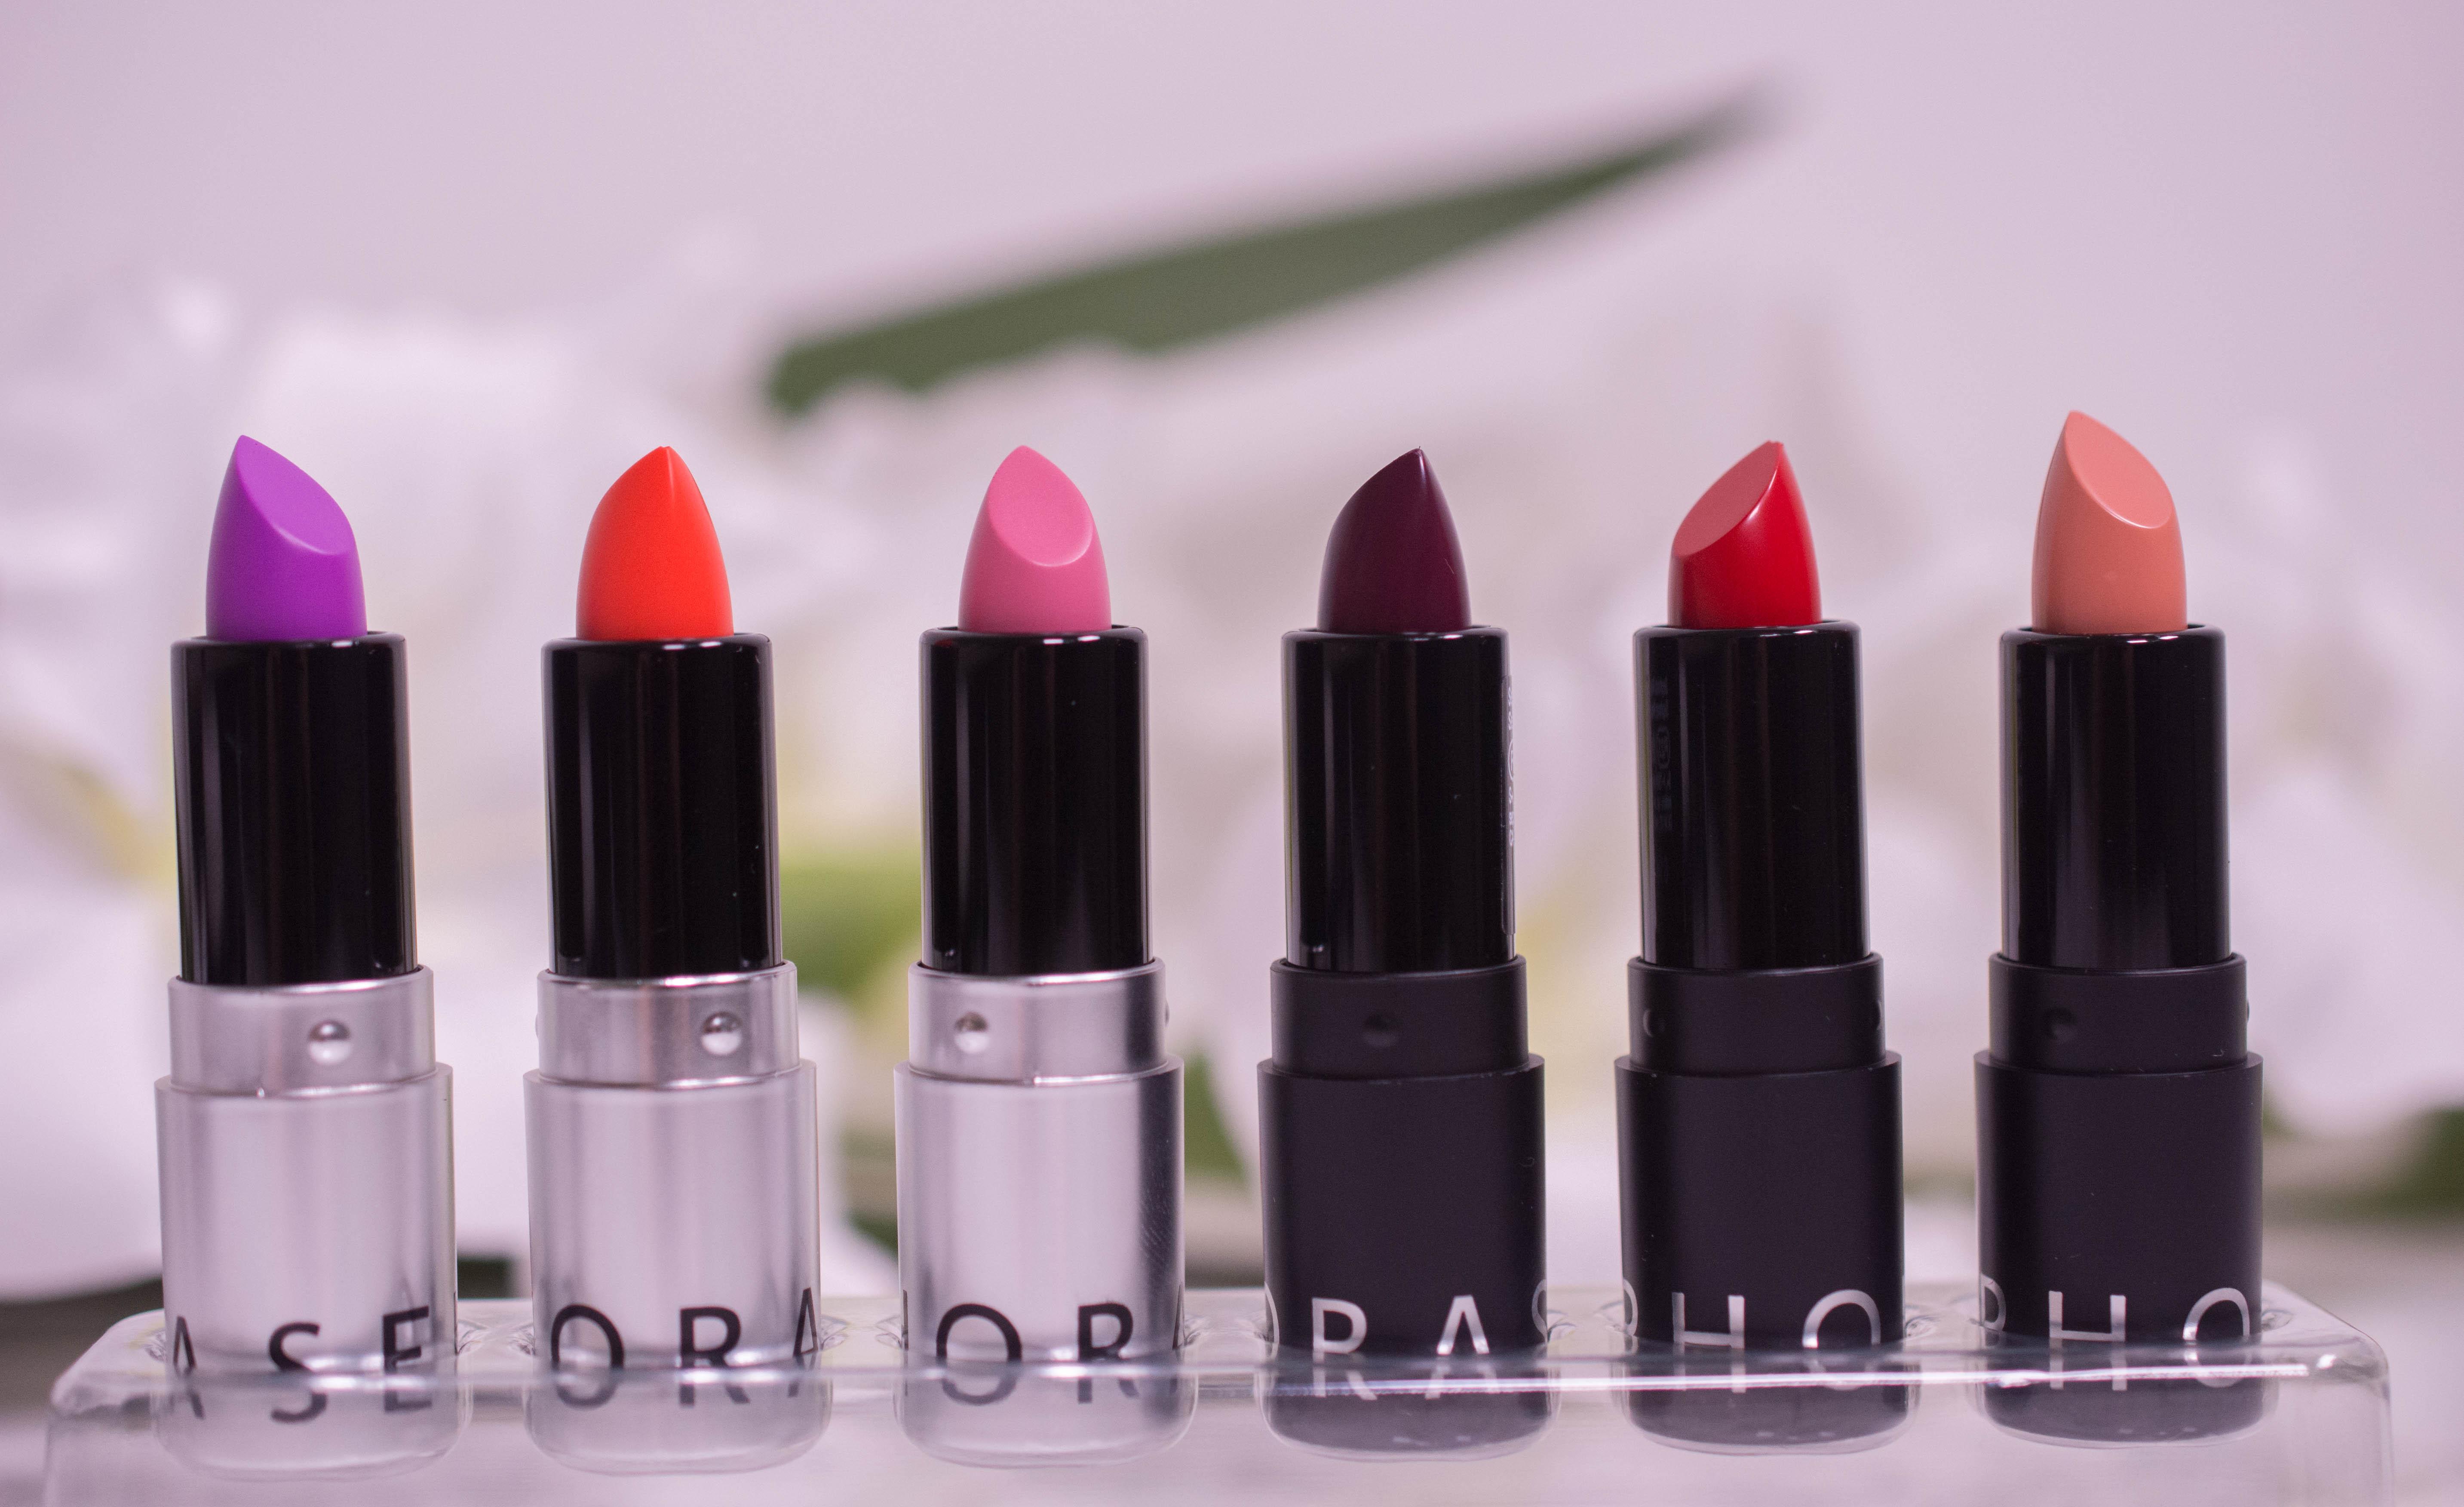 Sephora Rouge Lipstick Set - Cream & Shine